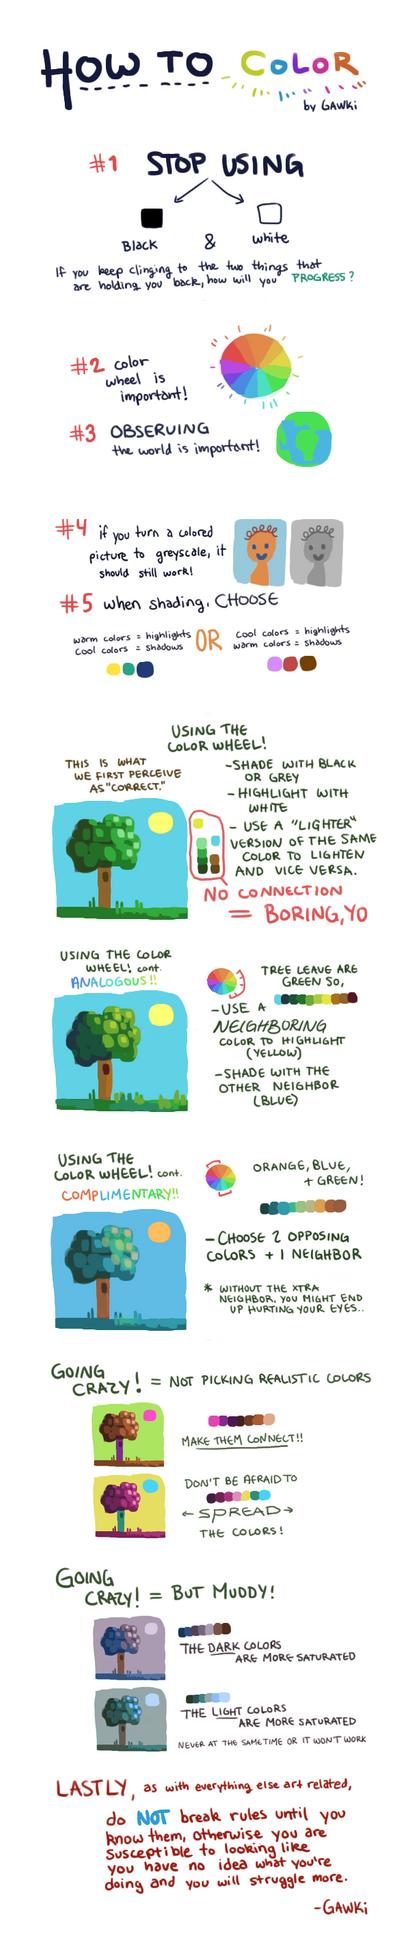 Coloring Tutorial by gawki